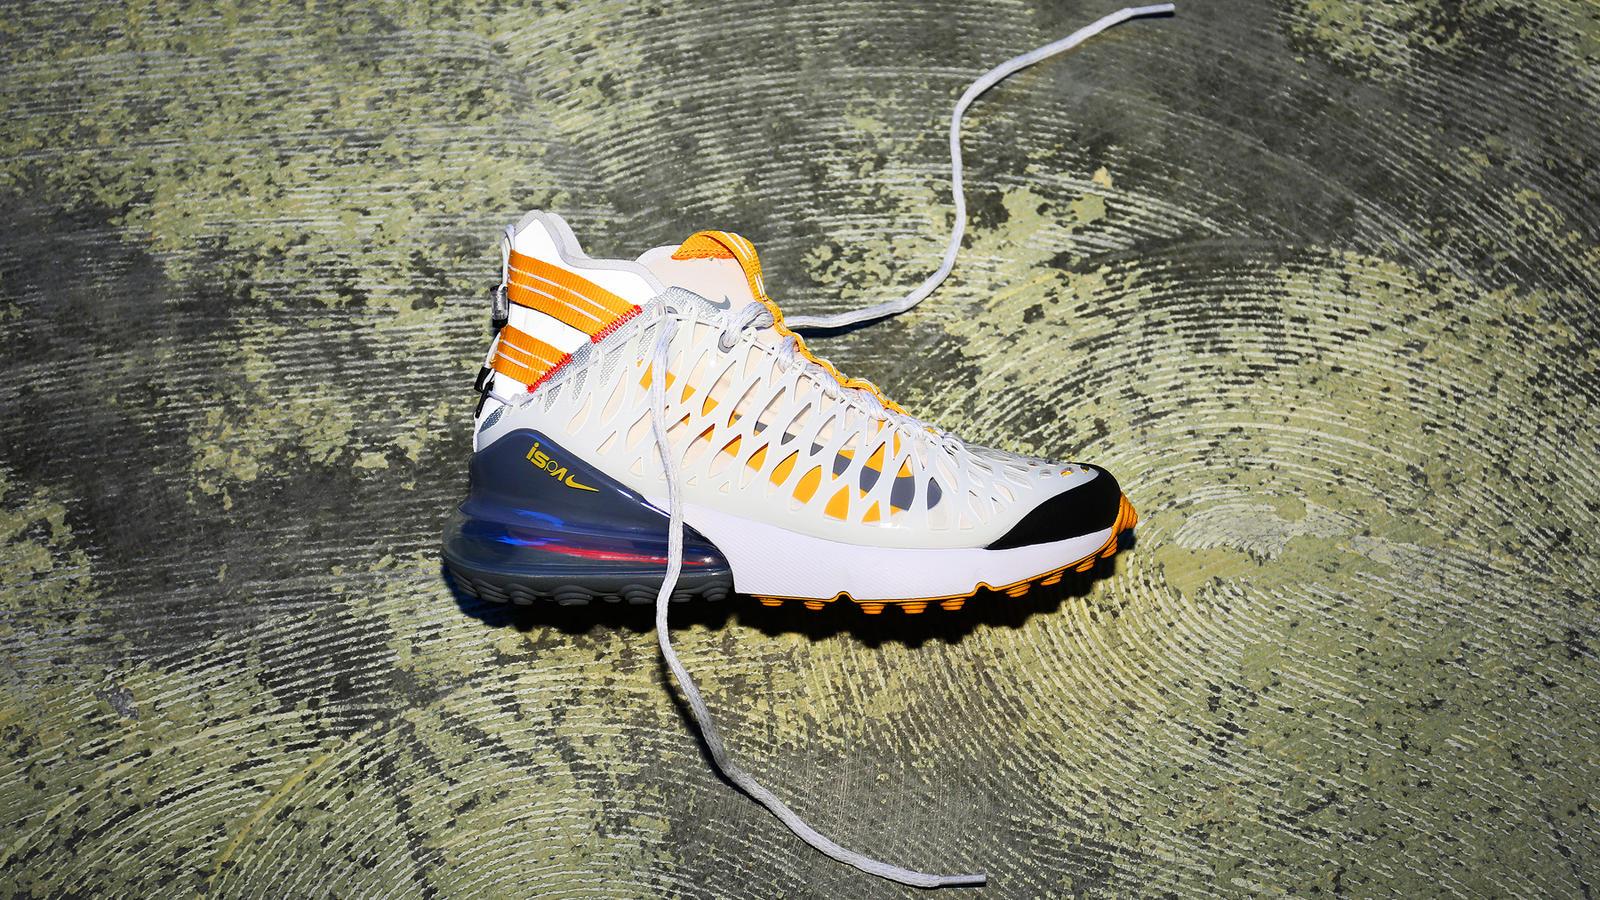 Nike Ispa Air Max 270 Legitimate Pictures four Kenlu Web 17b89c374ef1